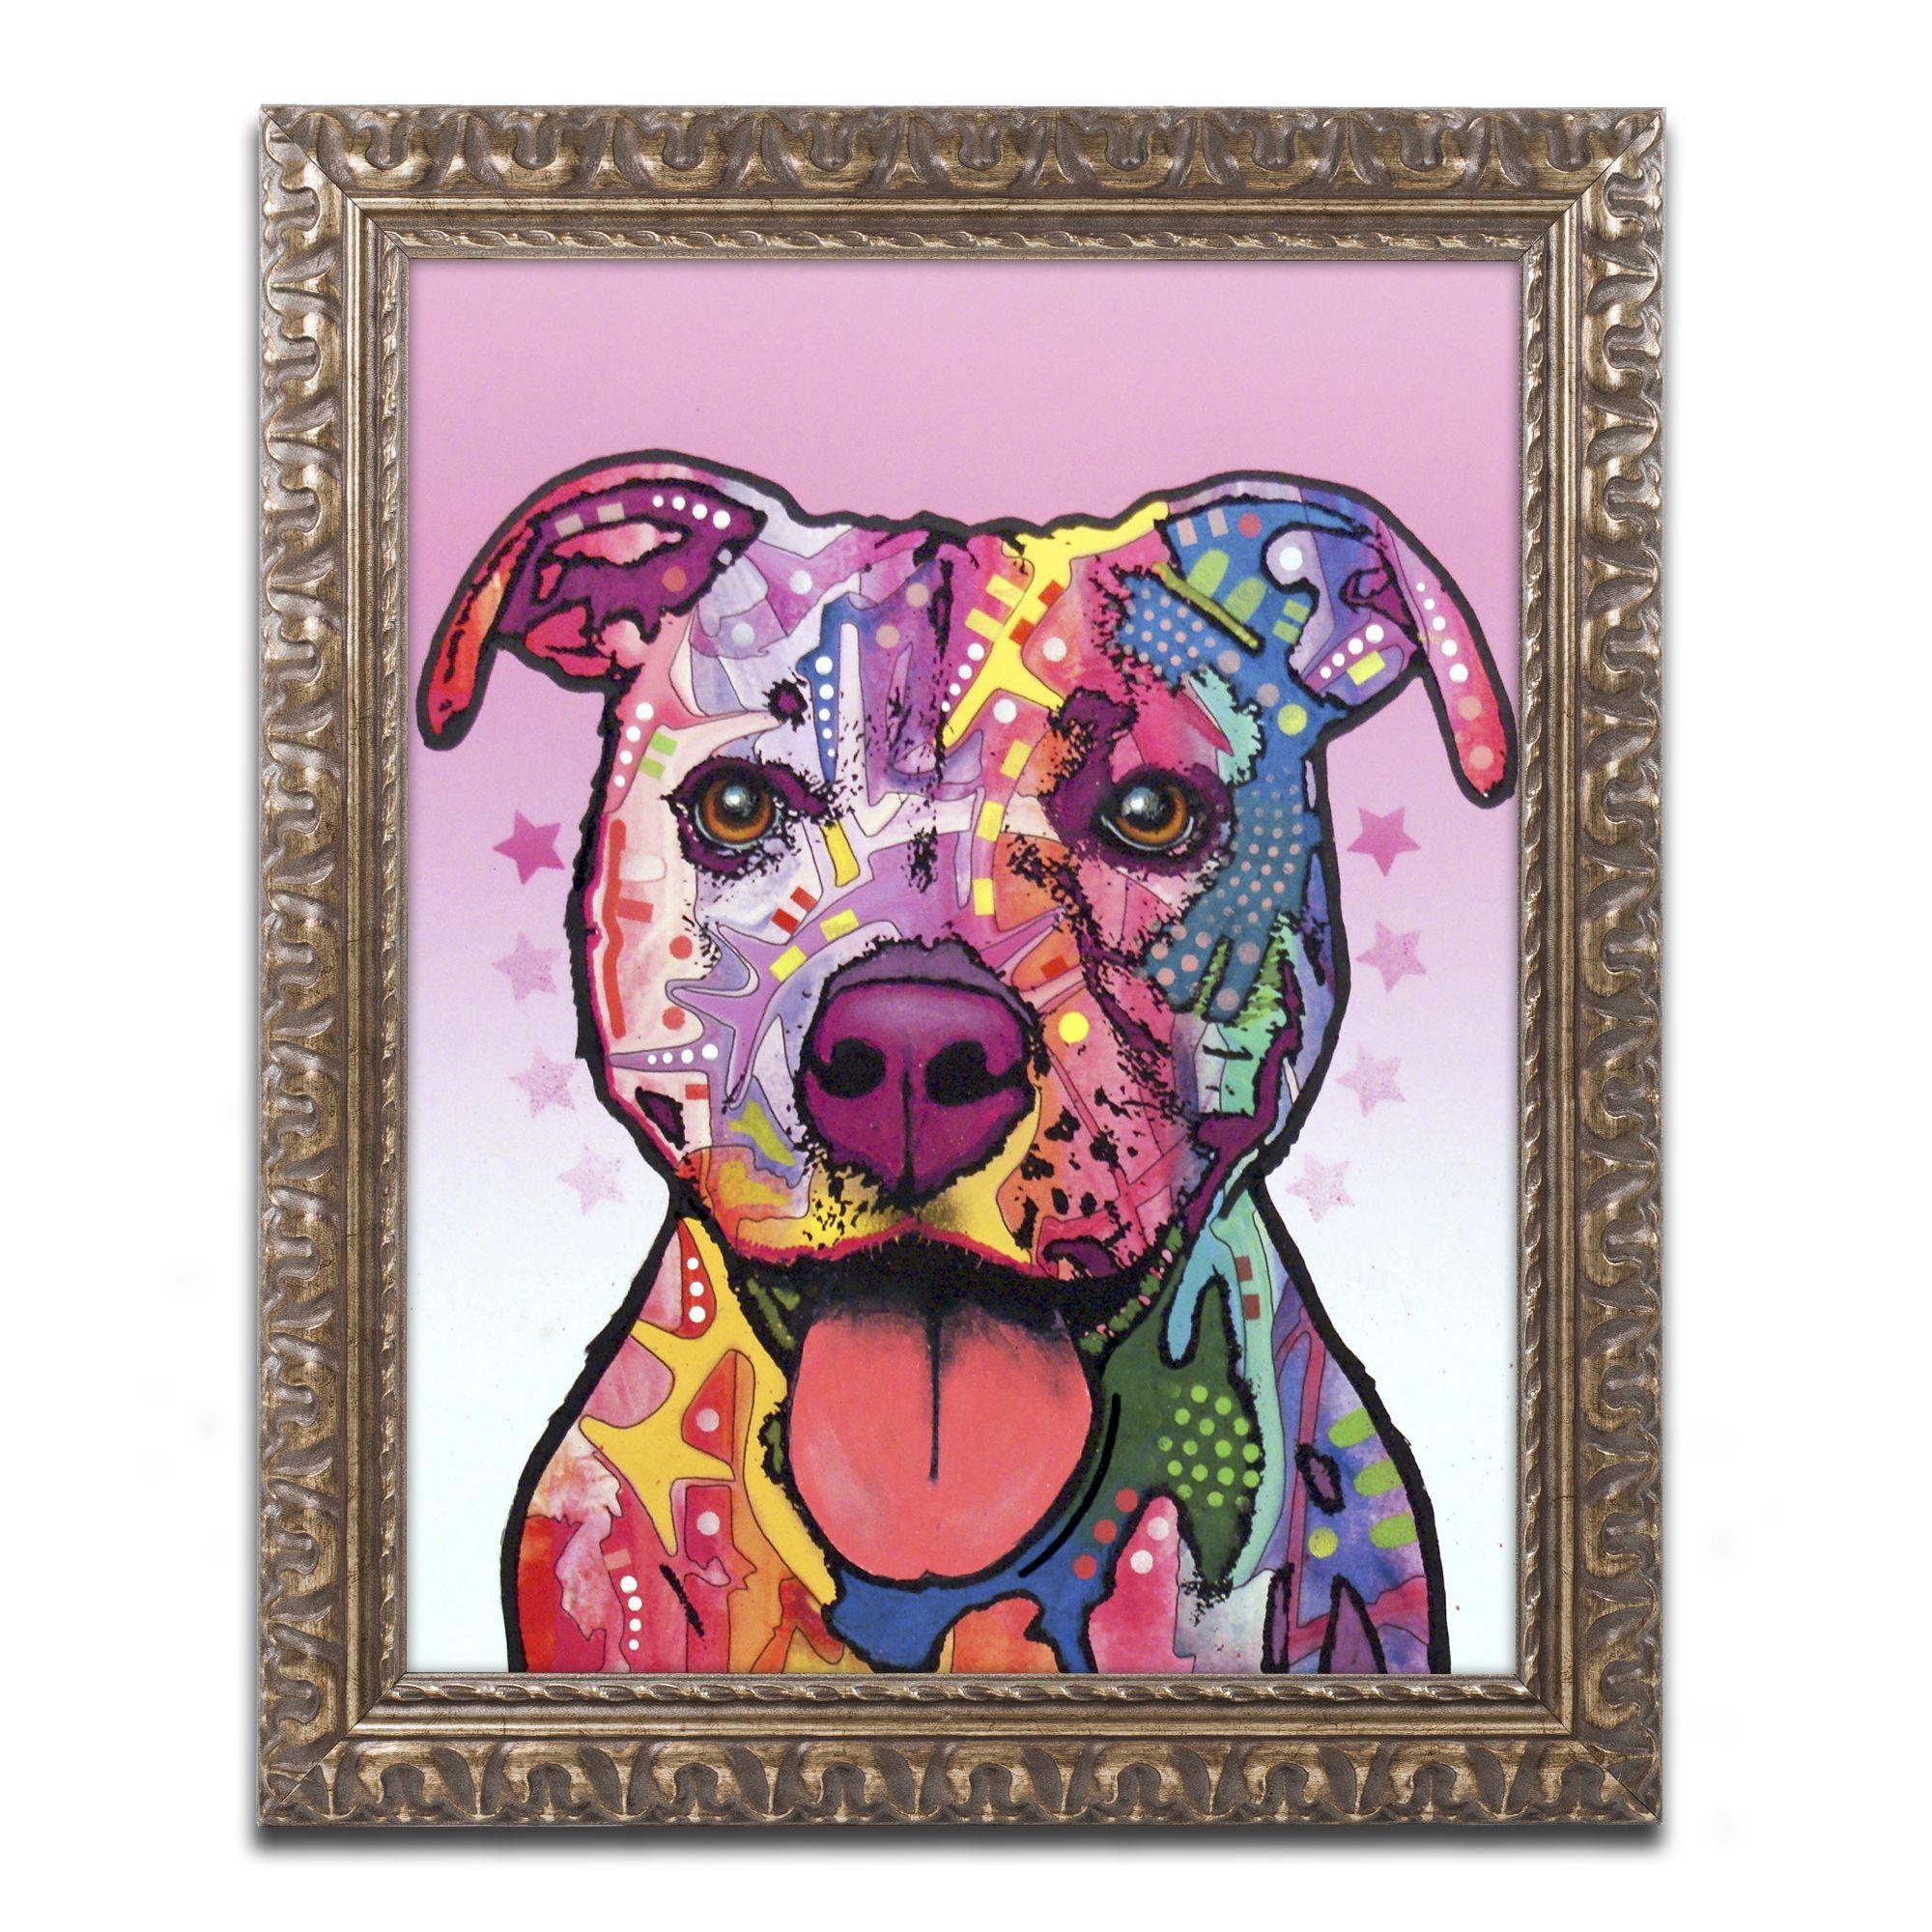 Pitbull Wall Art dean russo 'cherish the pitbull' ornate framed arttrademark